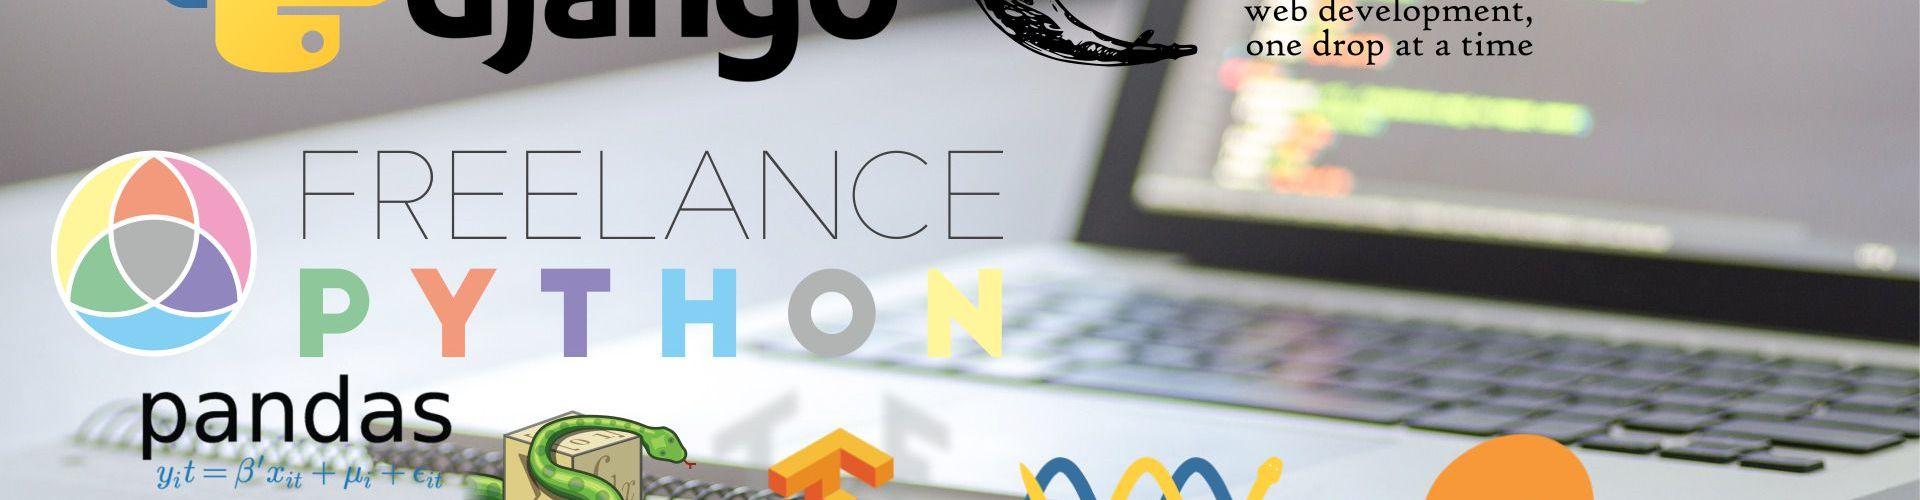 Freelance Python 👺